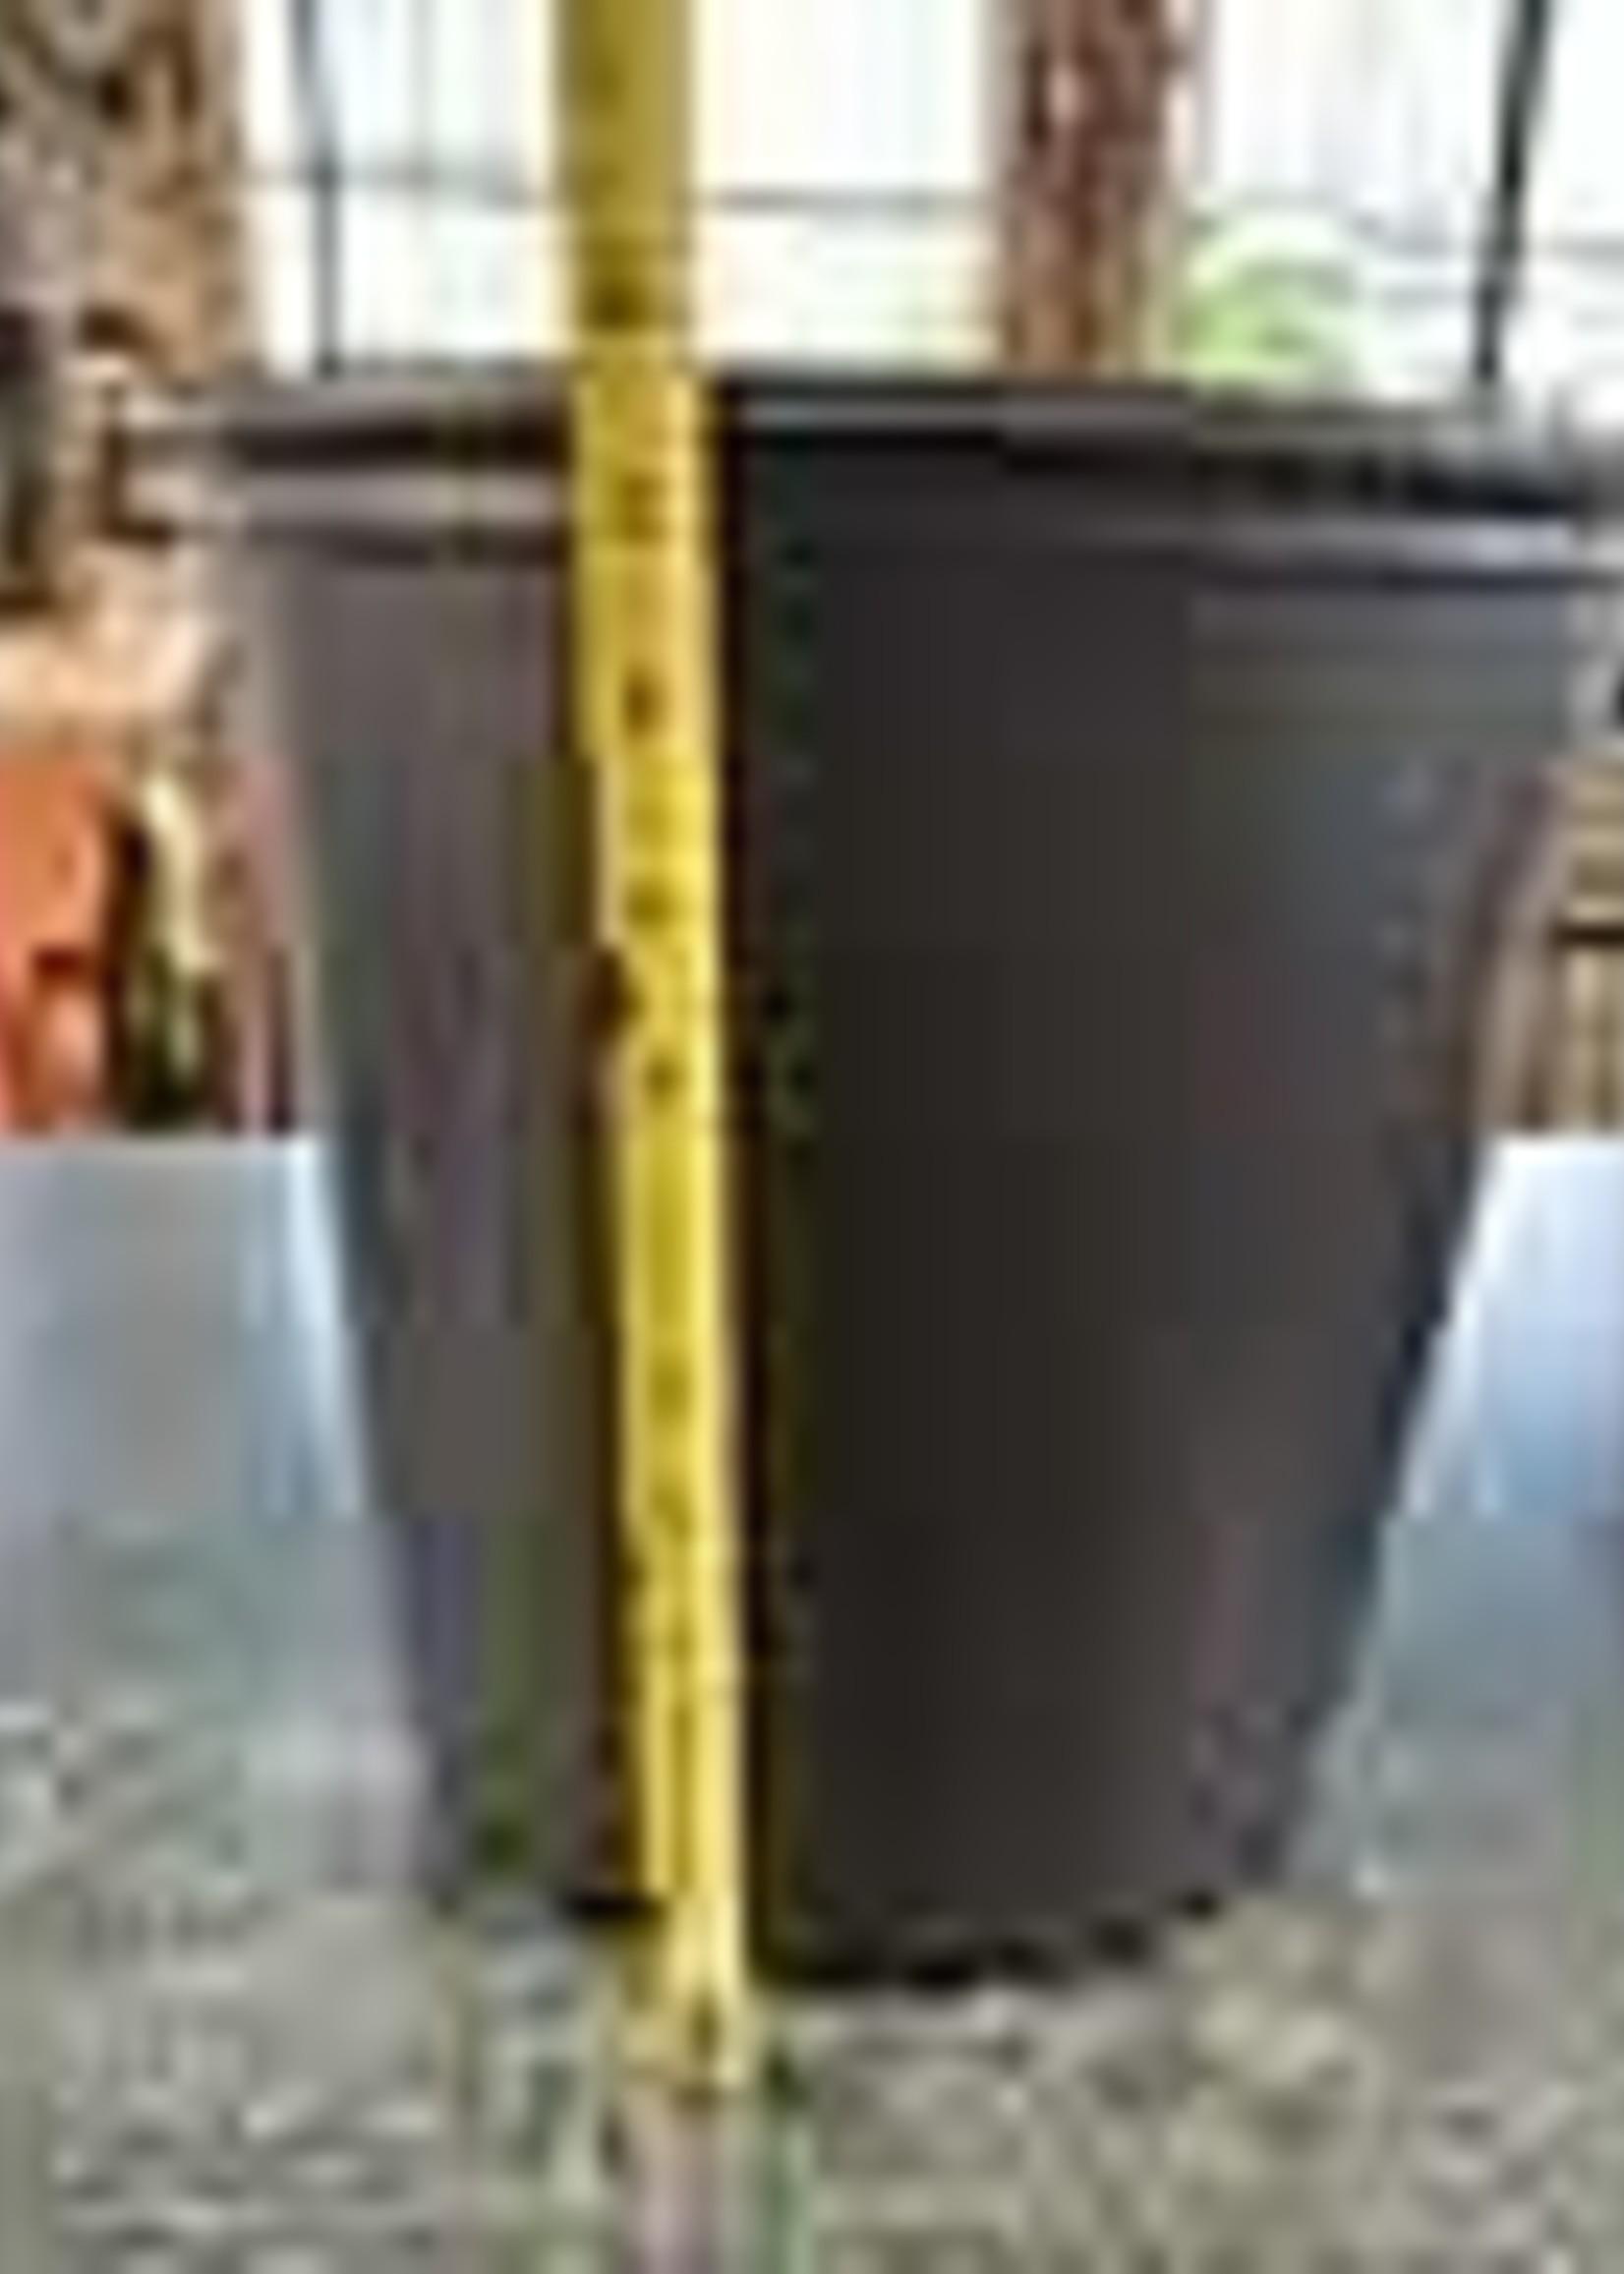 Haviland Nursery Pot, 4 gal. 500 series